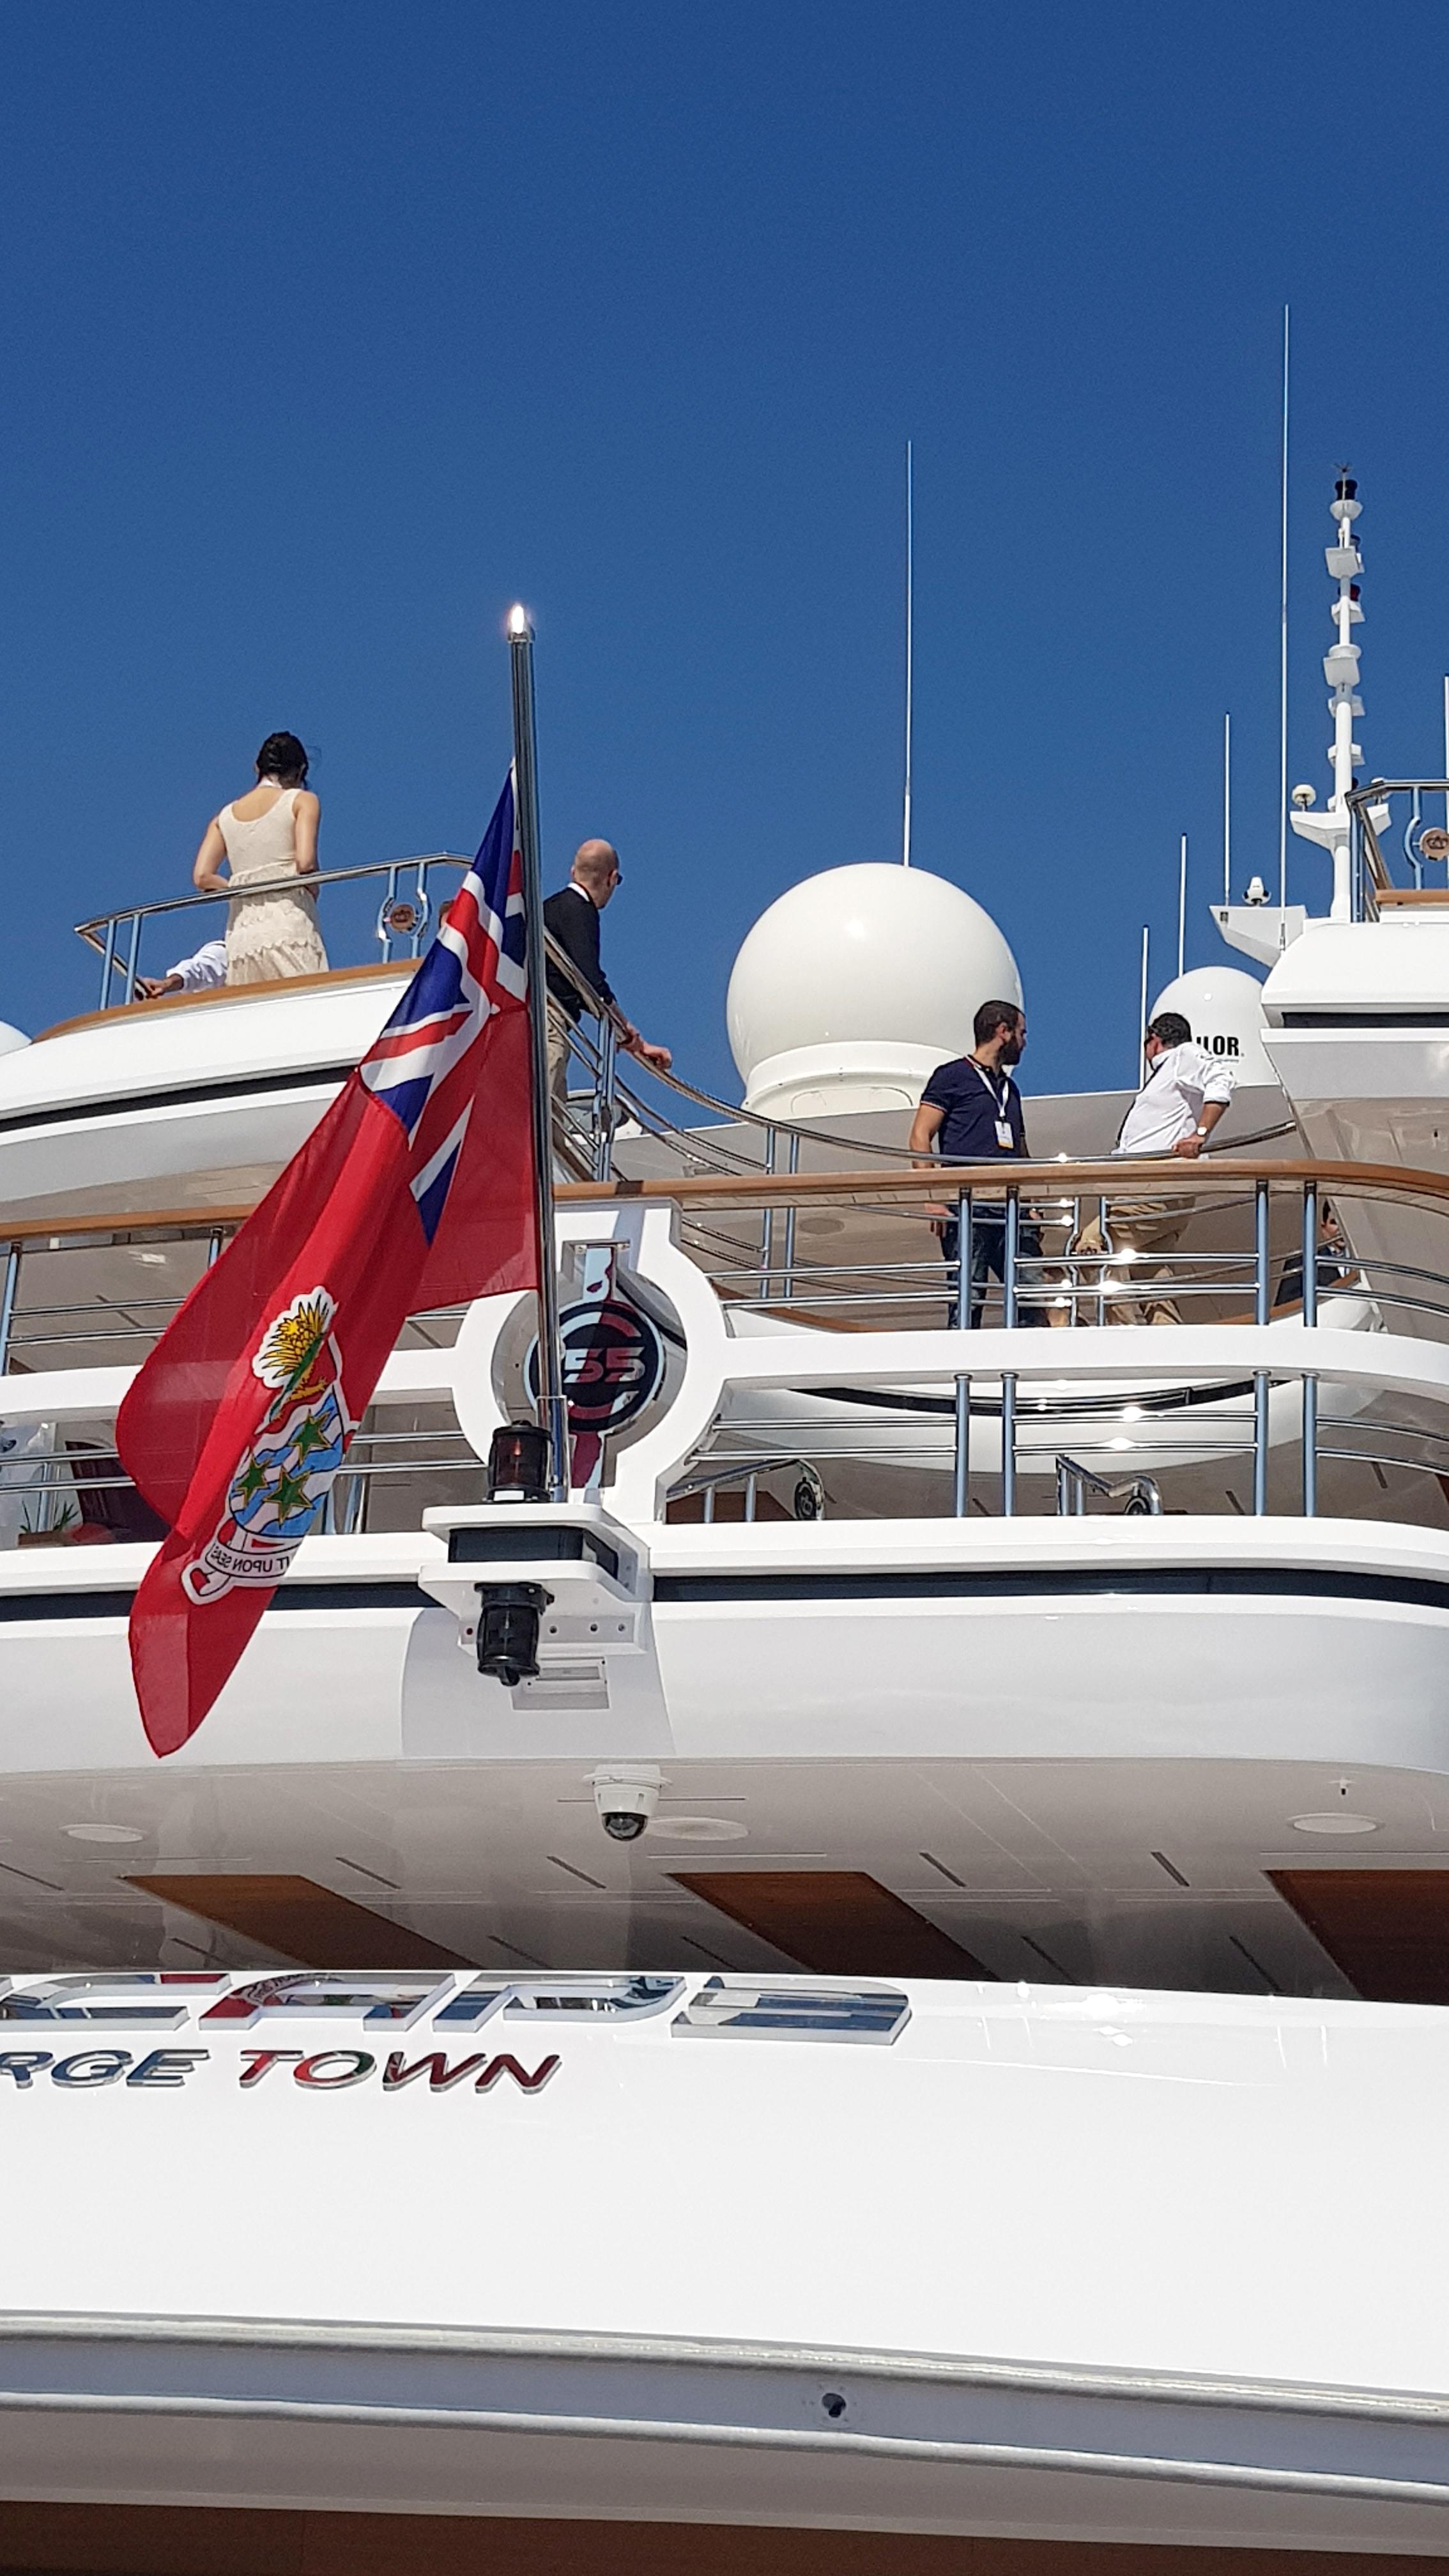 Majesty-155-at-the-Monaco-Yacht-Show-2017-2.jpg